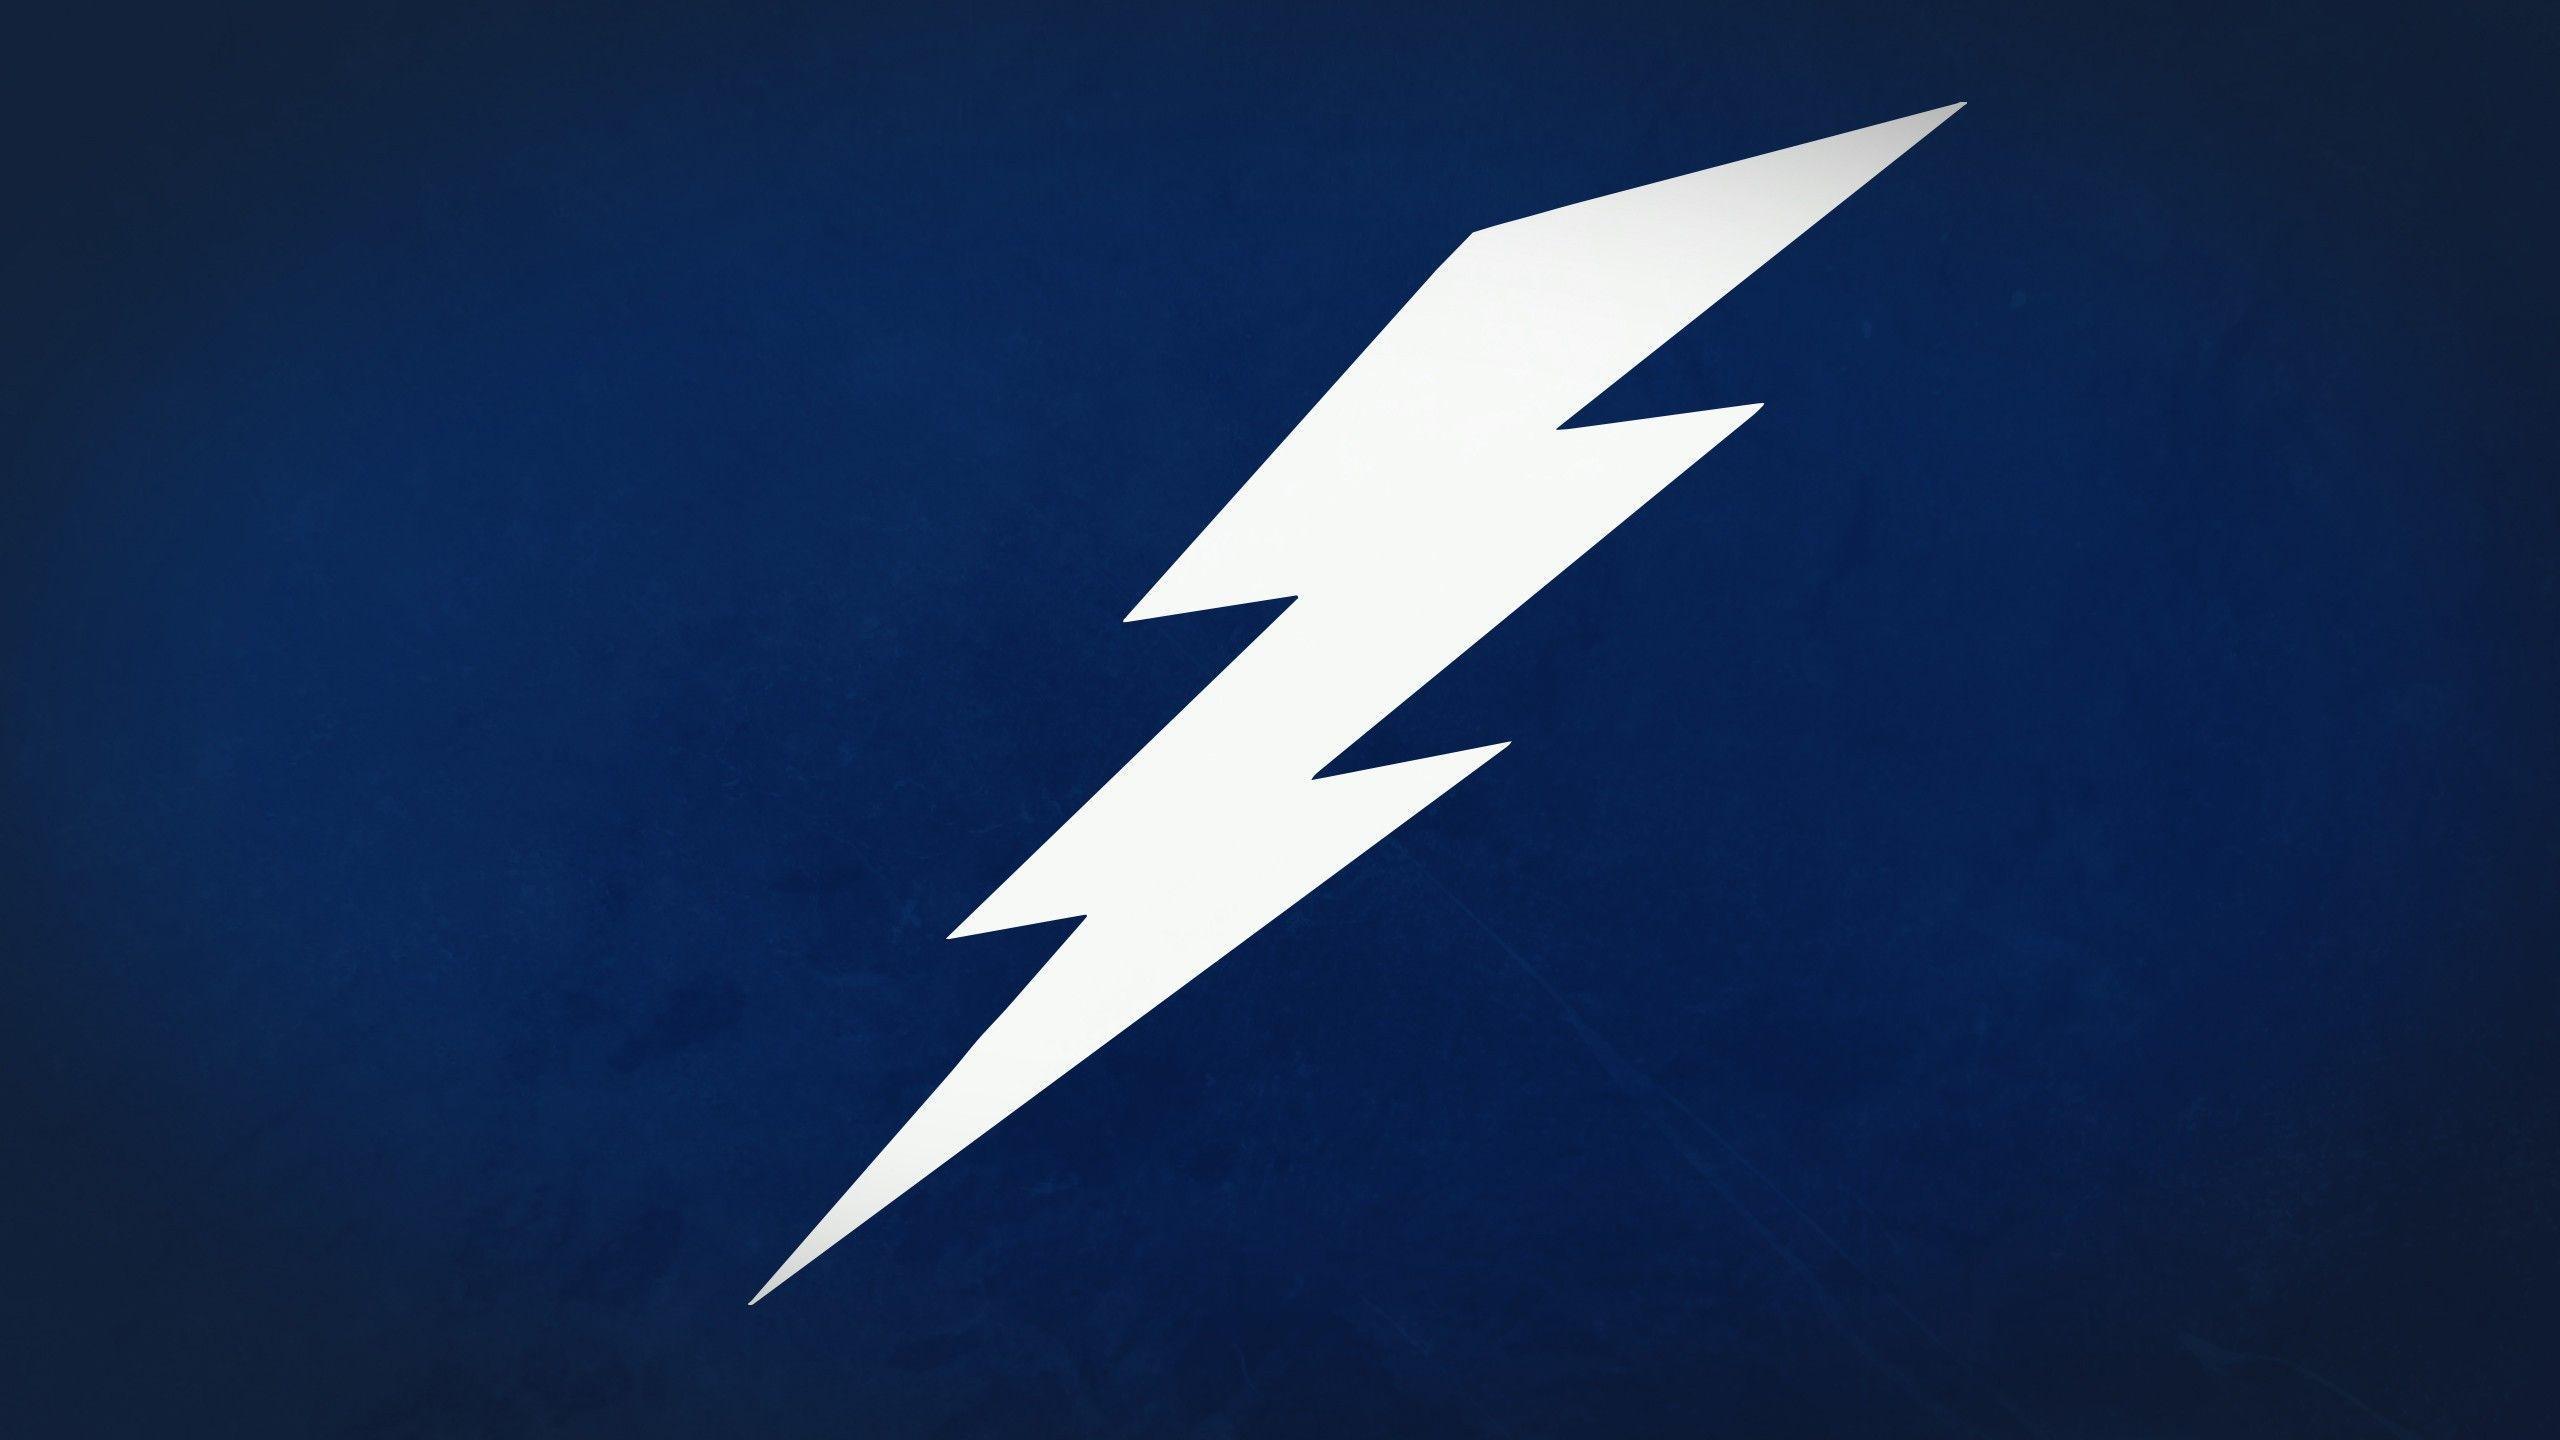 Tampa Bay Lightning Wallpapers | Tampa Bay Lightning Backgrounds